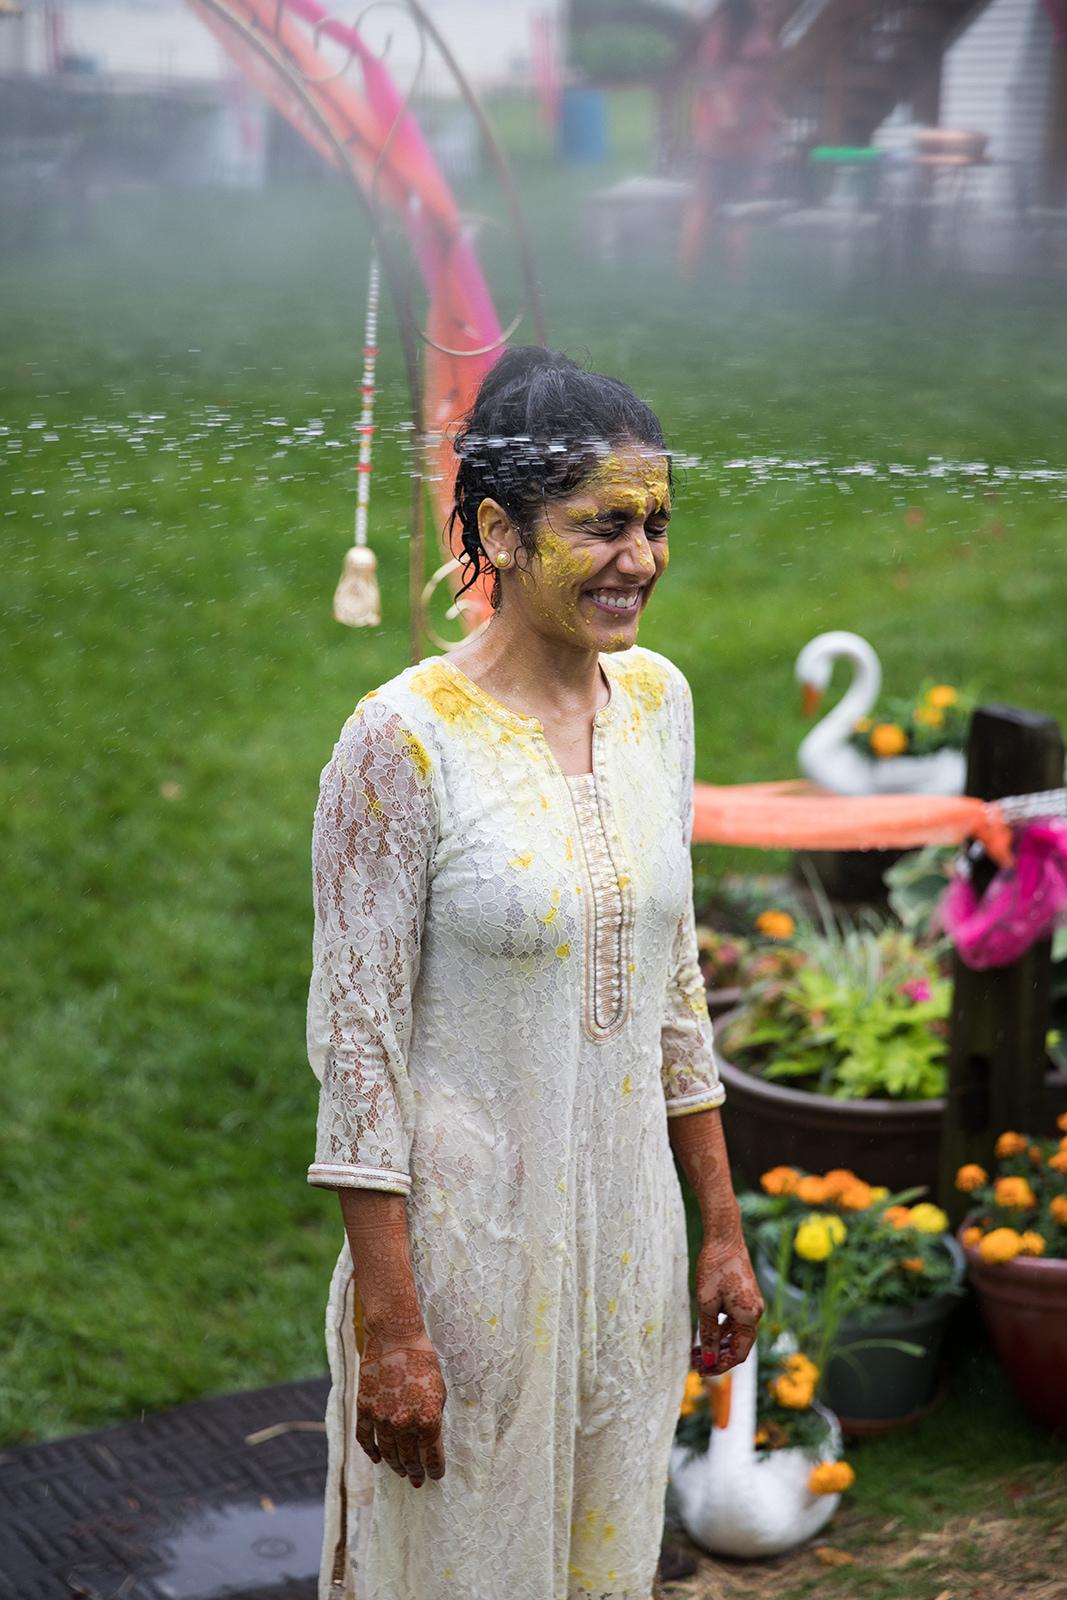 Le Cape Weddings - Sumeet and Chavi - Pithi-42-2.jpg